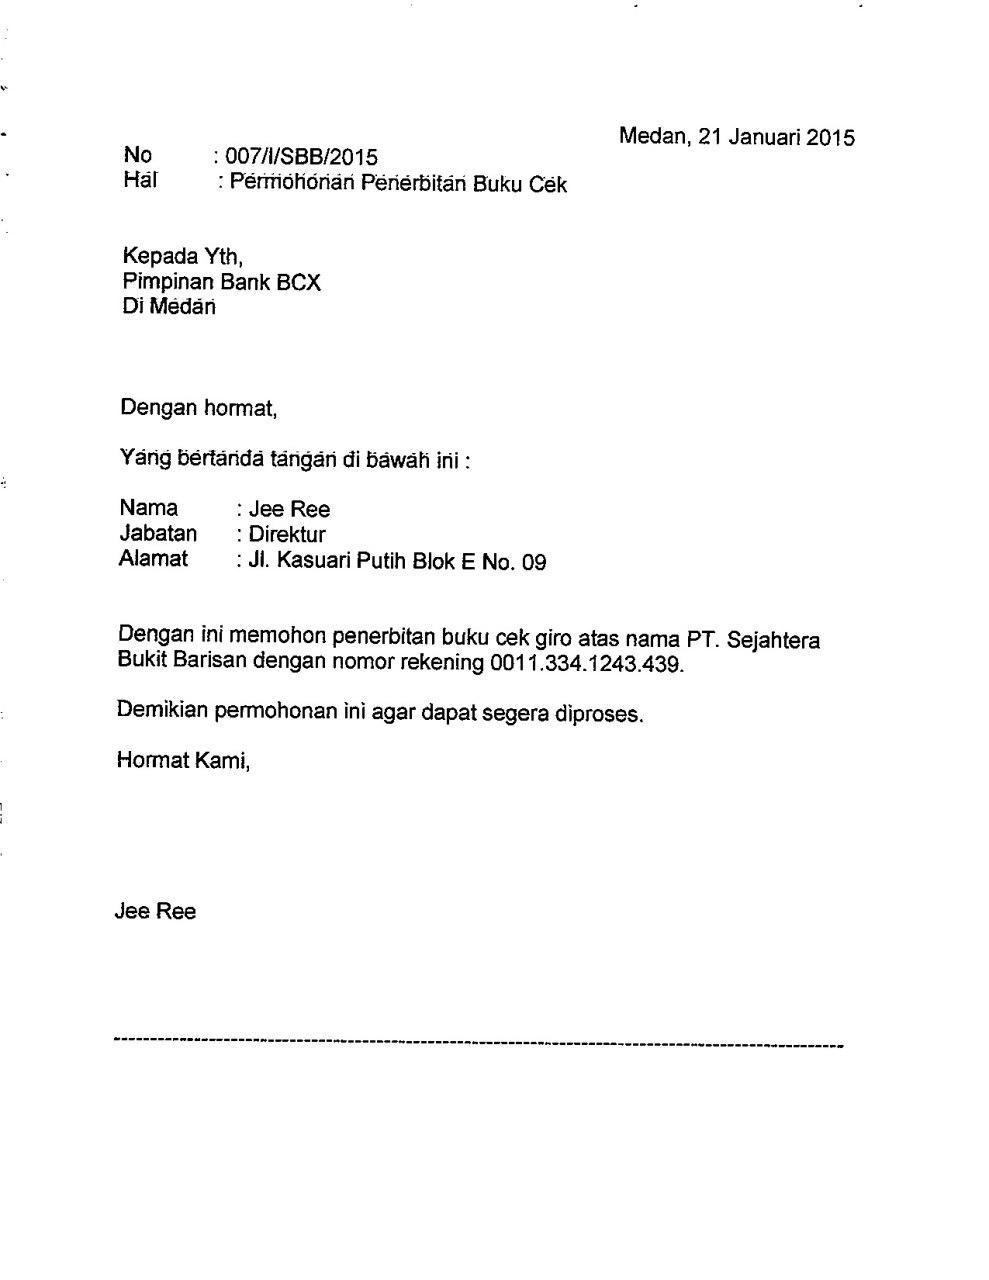 Contoh Surat Permohonan Pengaktifan Rekening Bank Mandiri Cuitan